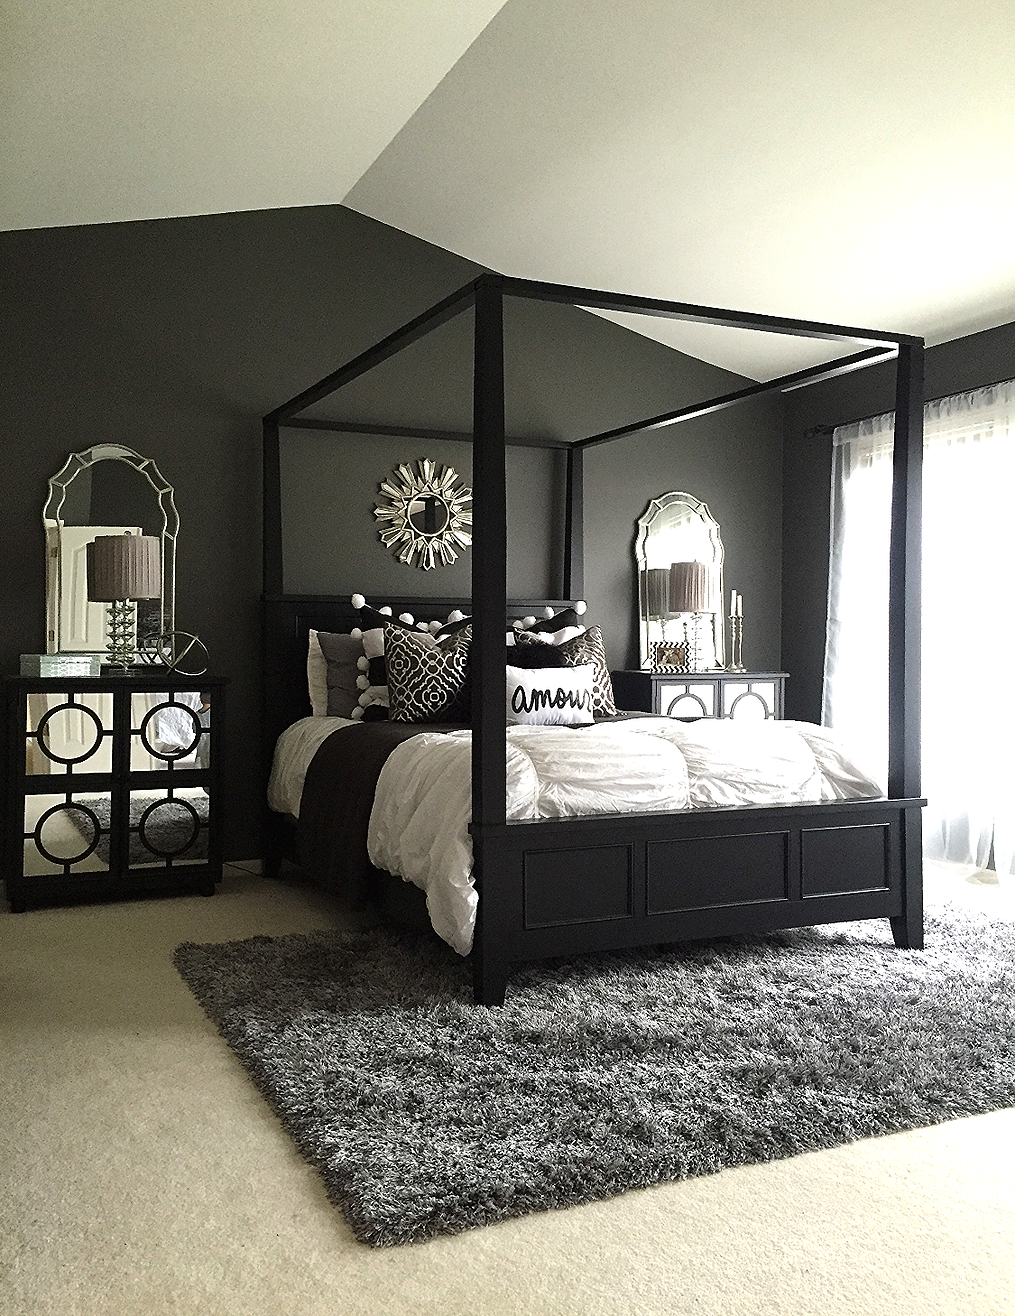 Haneens Haven White Bedroom Decor Home Bedroom Black Master